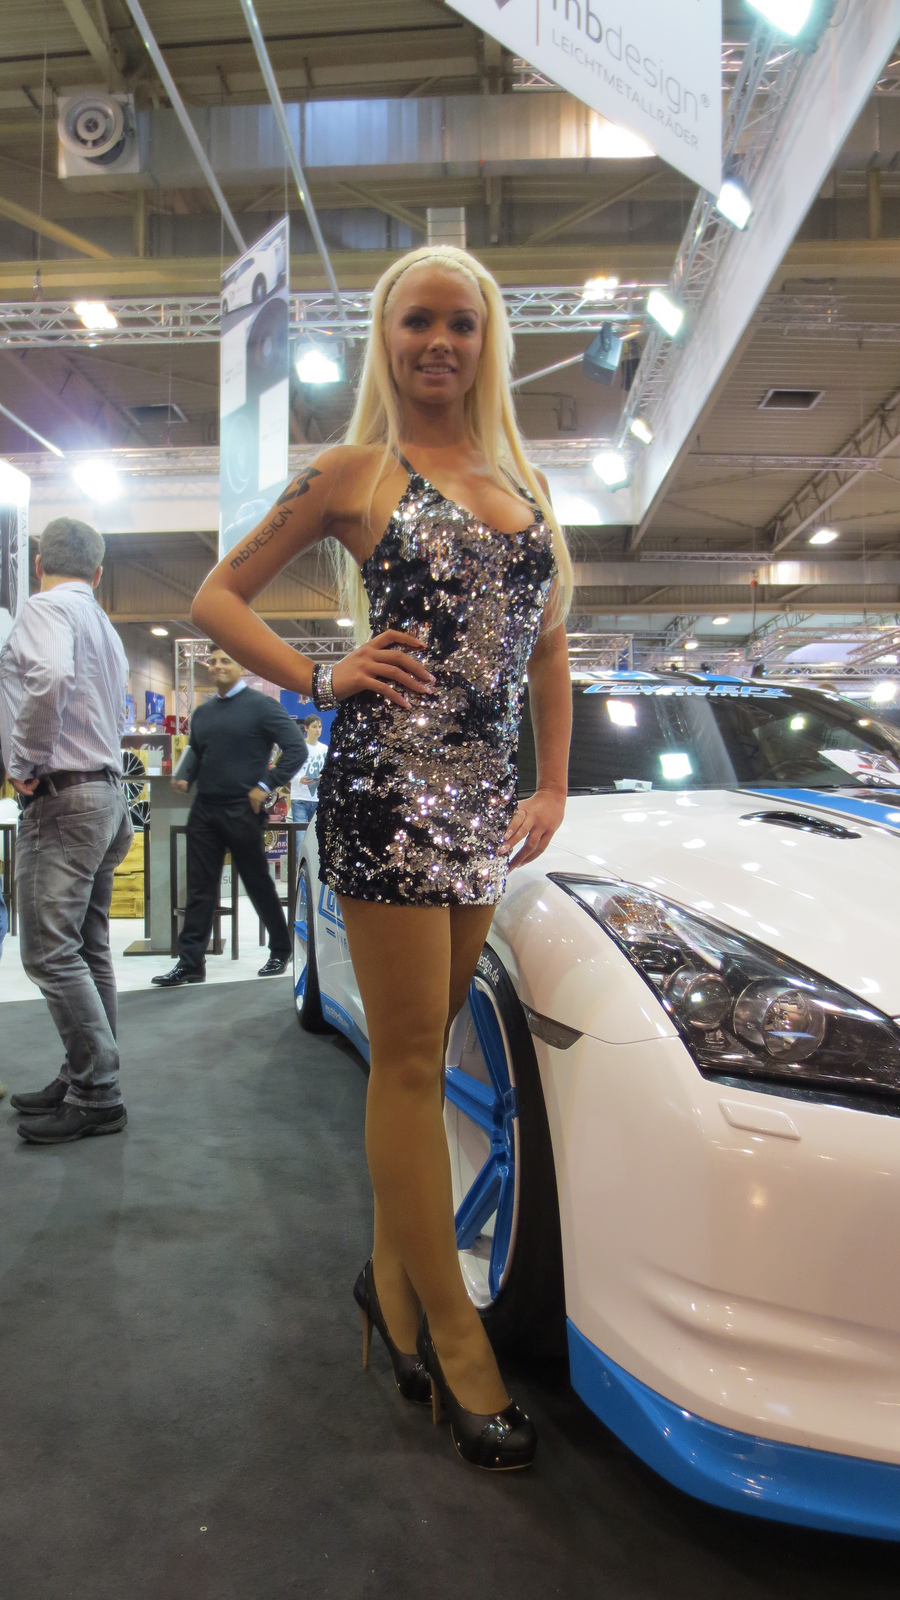 New Ford Car >> Girls at Essen Motor Show 2012 - autoevolution